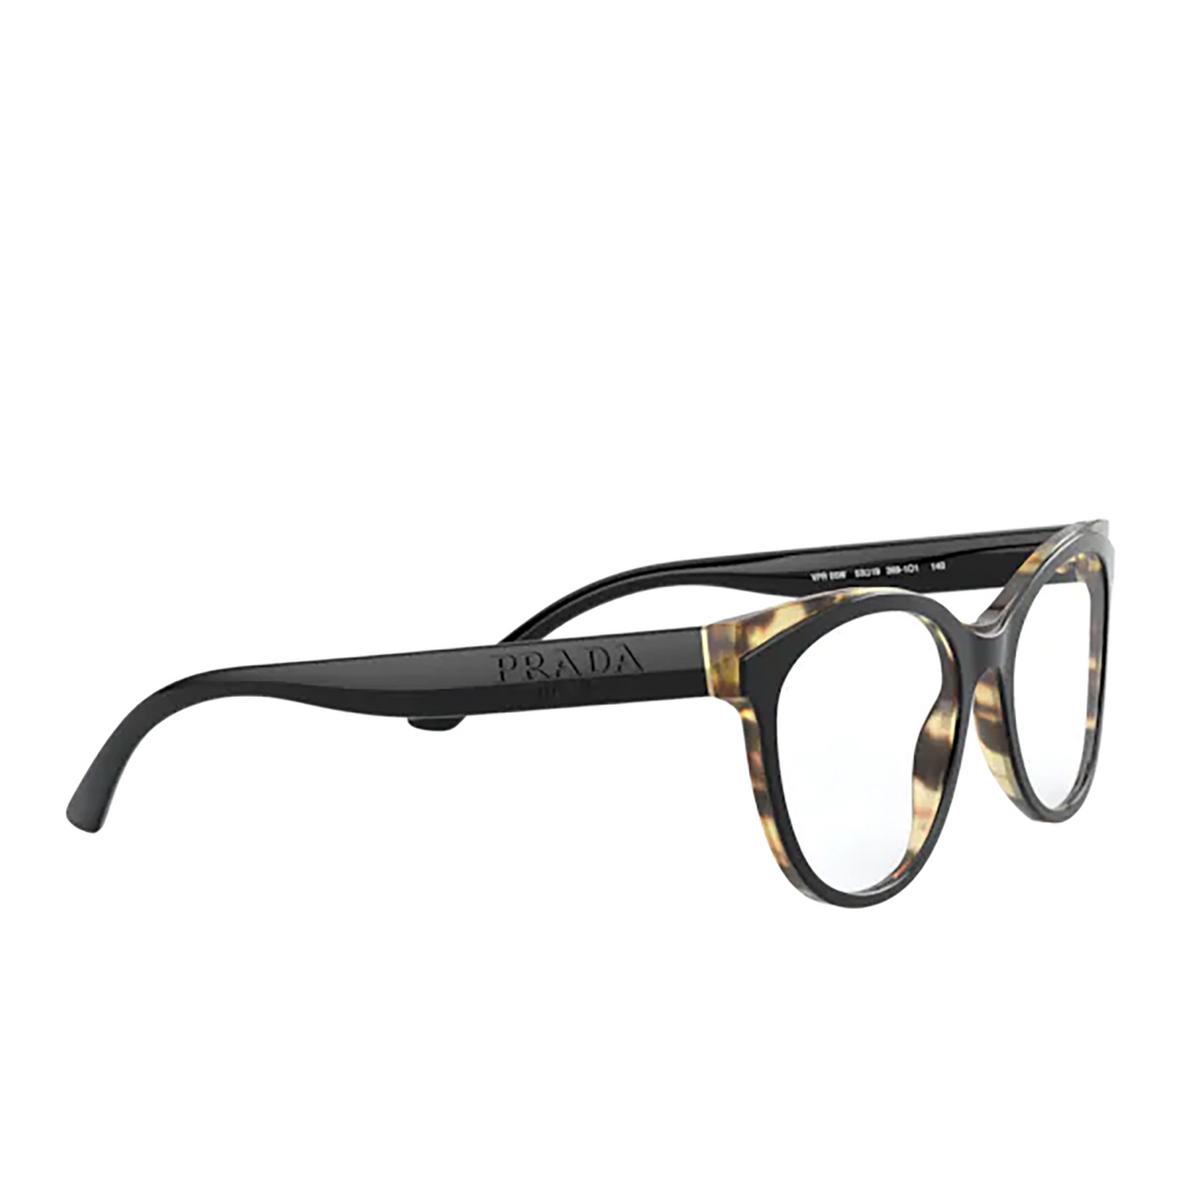 Prada® Butterfly Eyeglasses: PR 05WV color Black / Havana 3891O1 - three-quarters view.